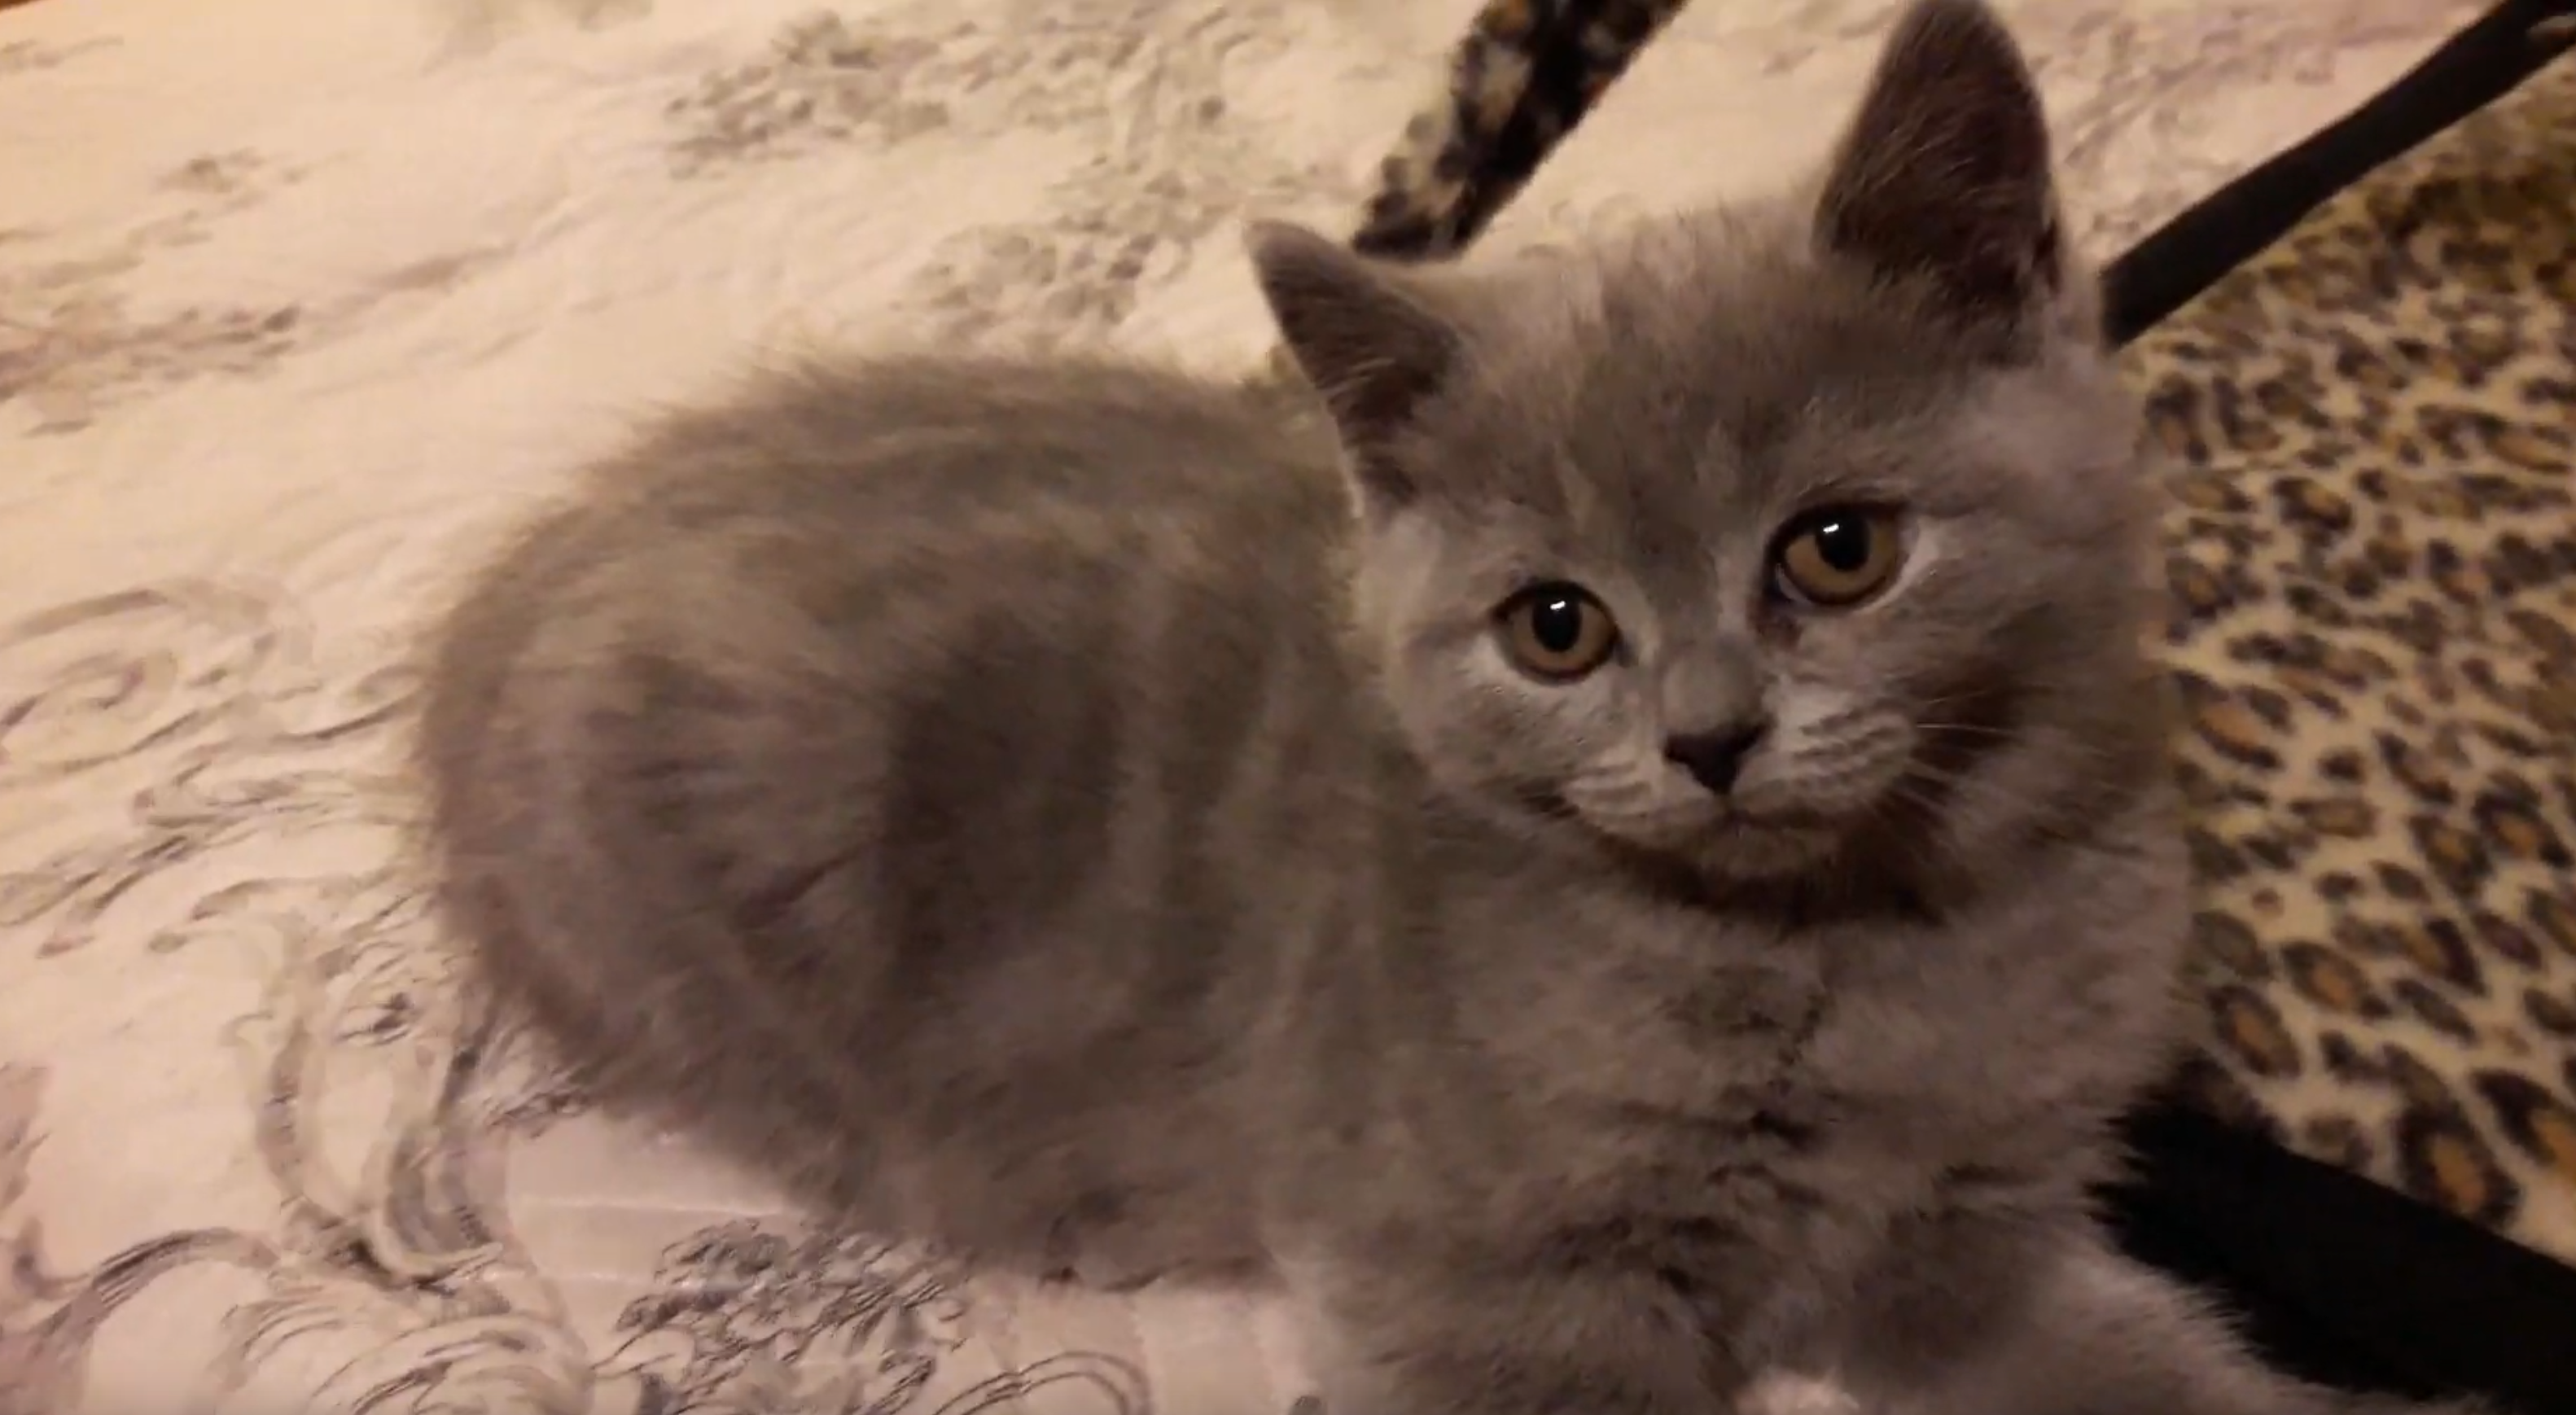 VIDEO – Compilation Cute Kitten